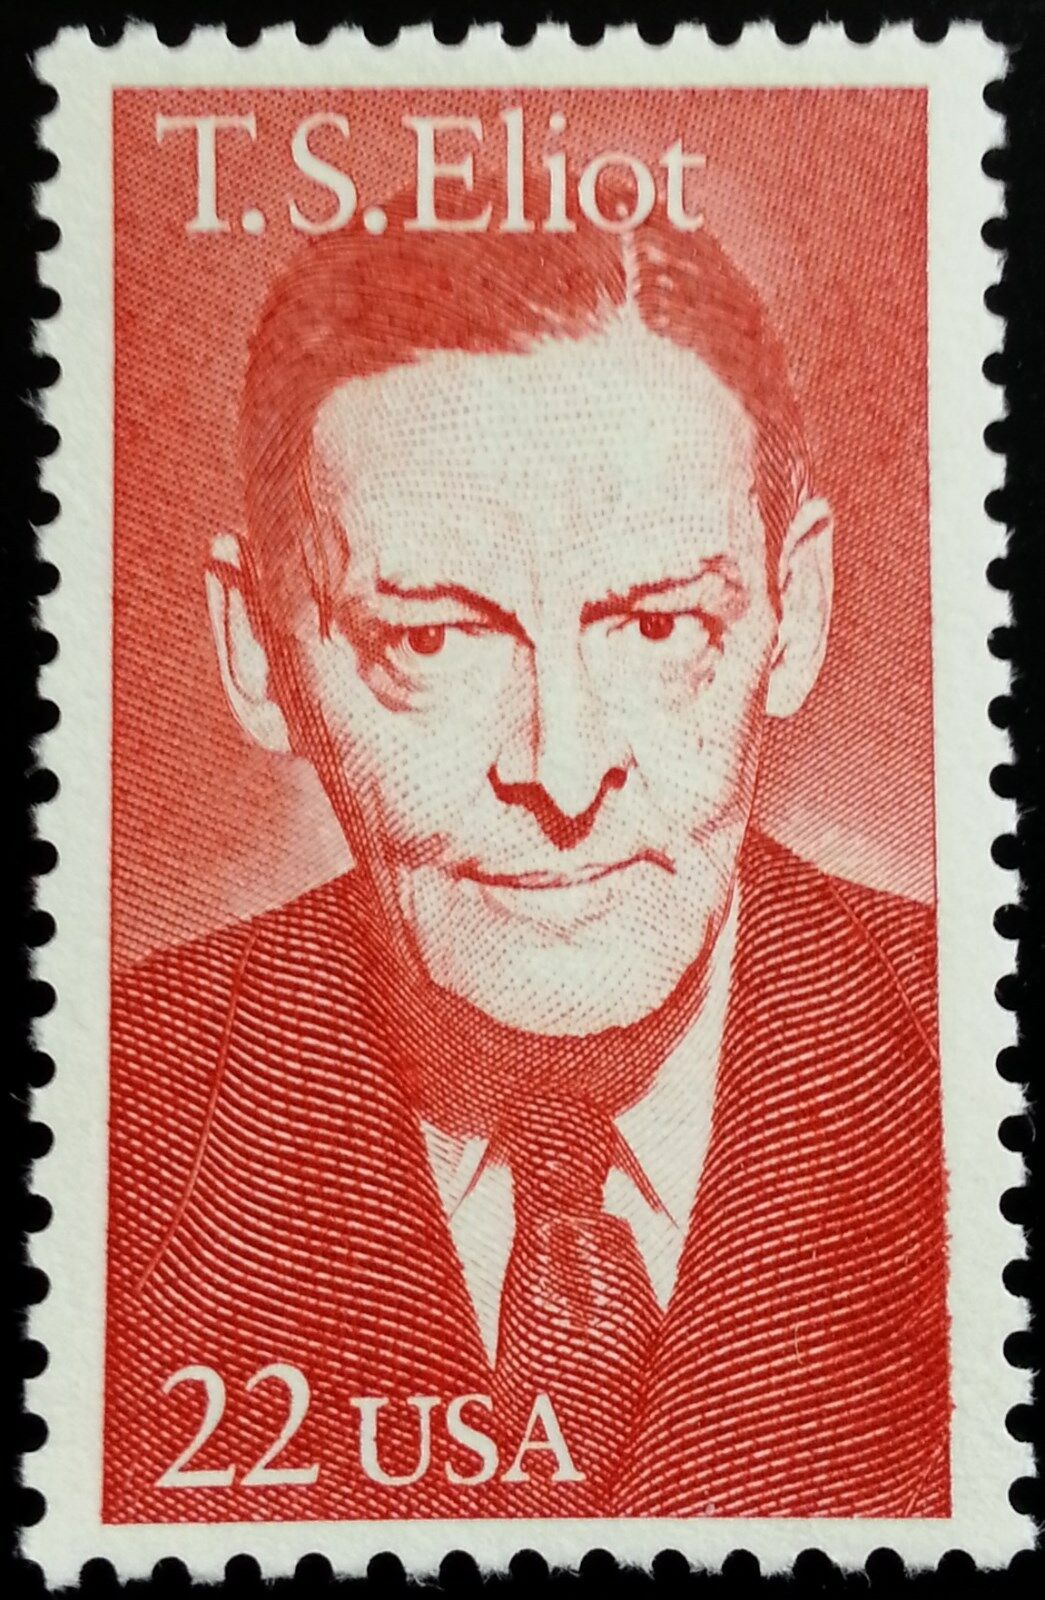 1986 22c T.S. Eliot, Author & Major Poet Scott 2239 Min